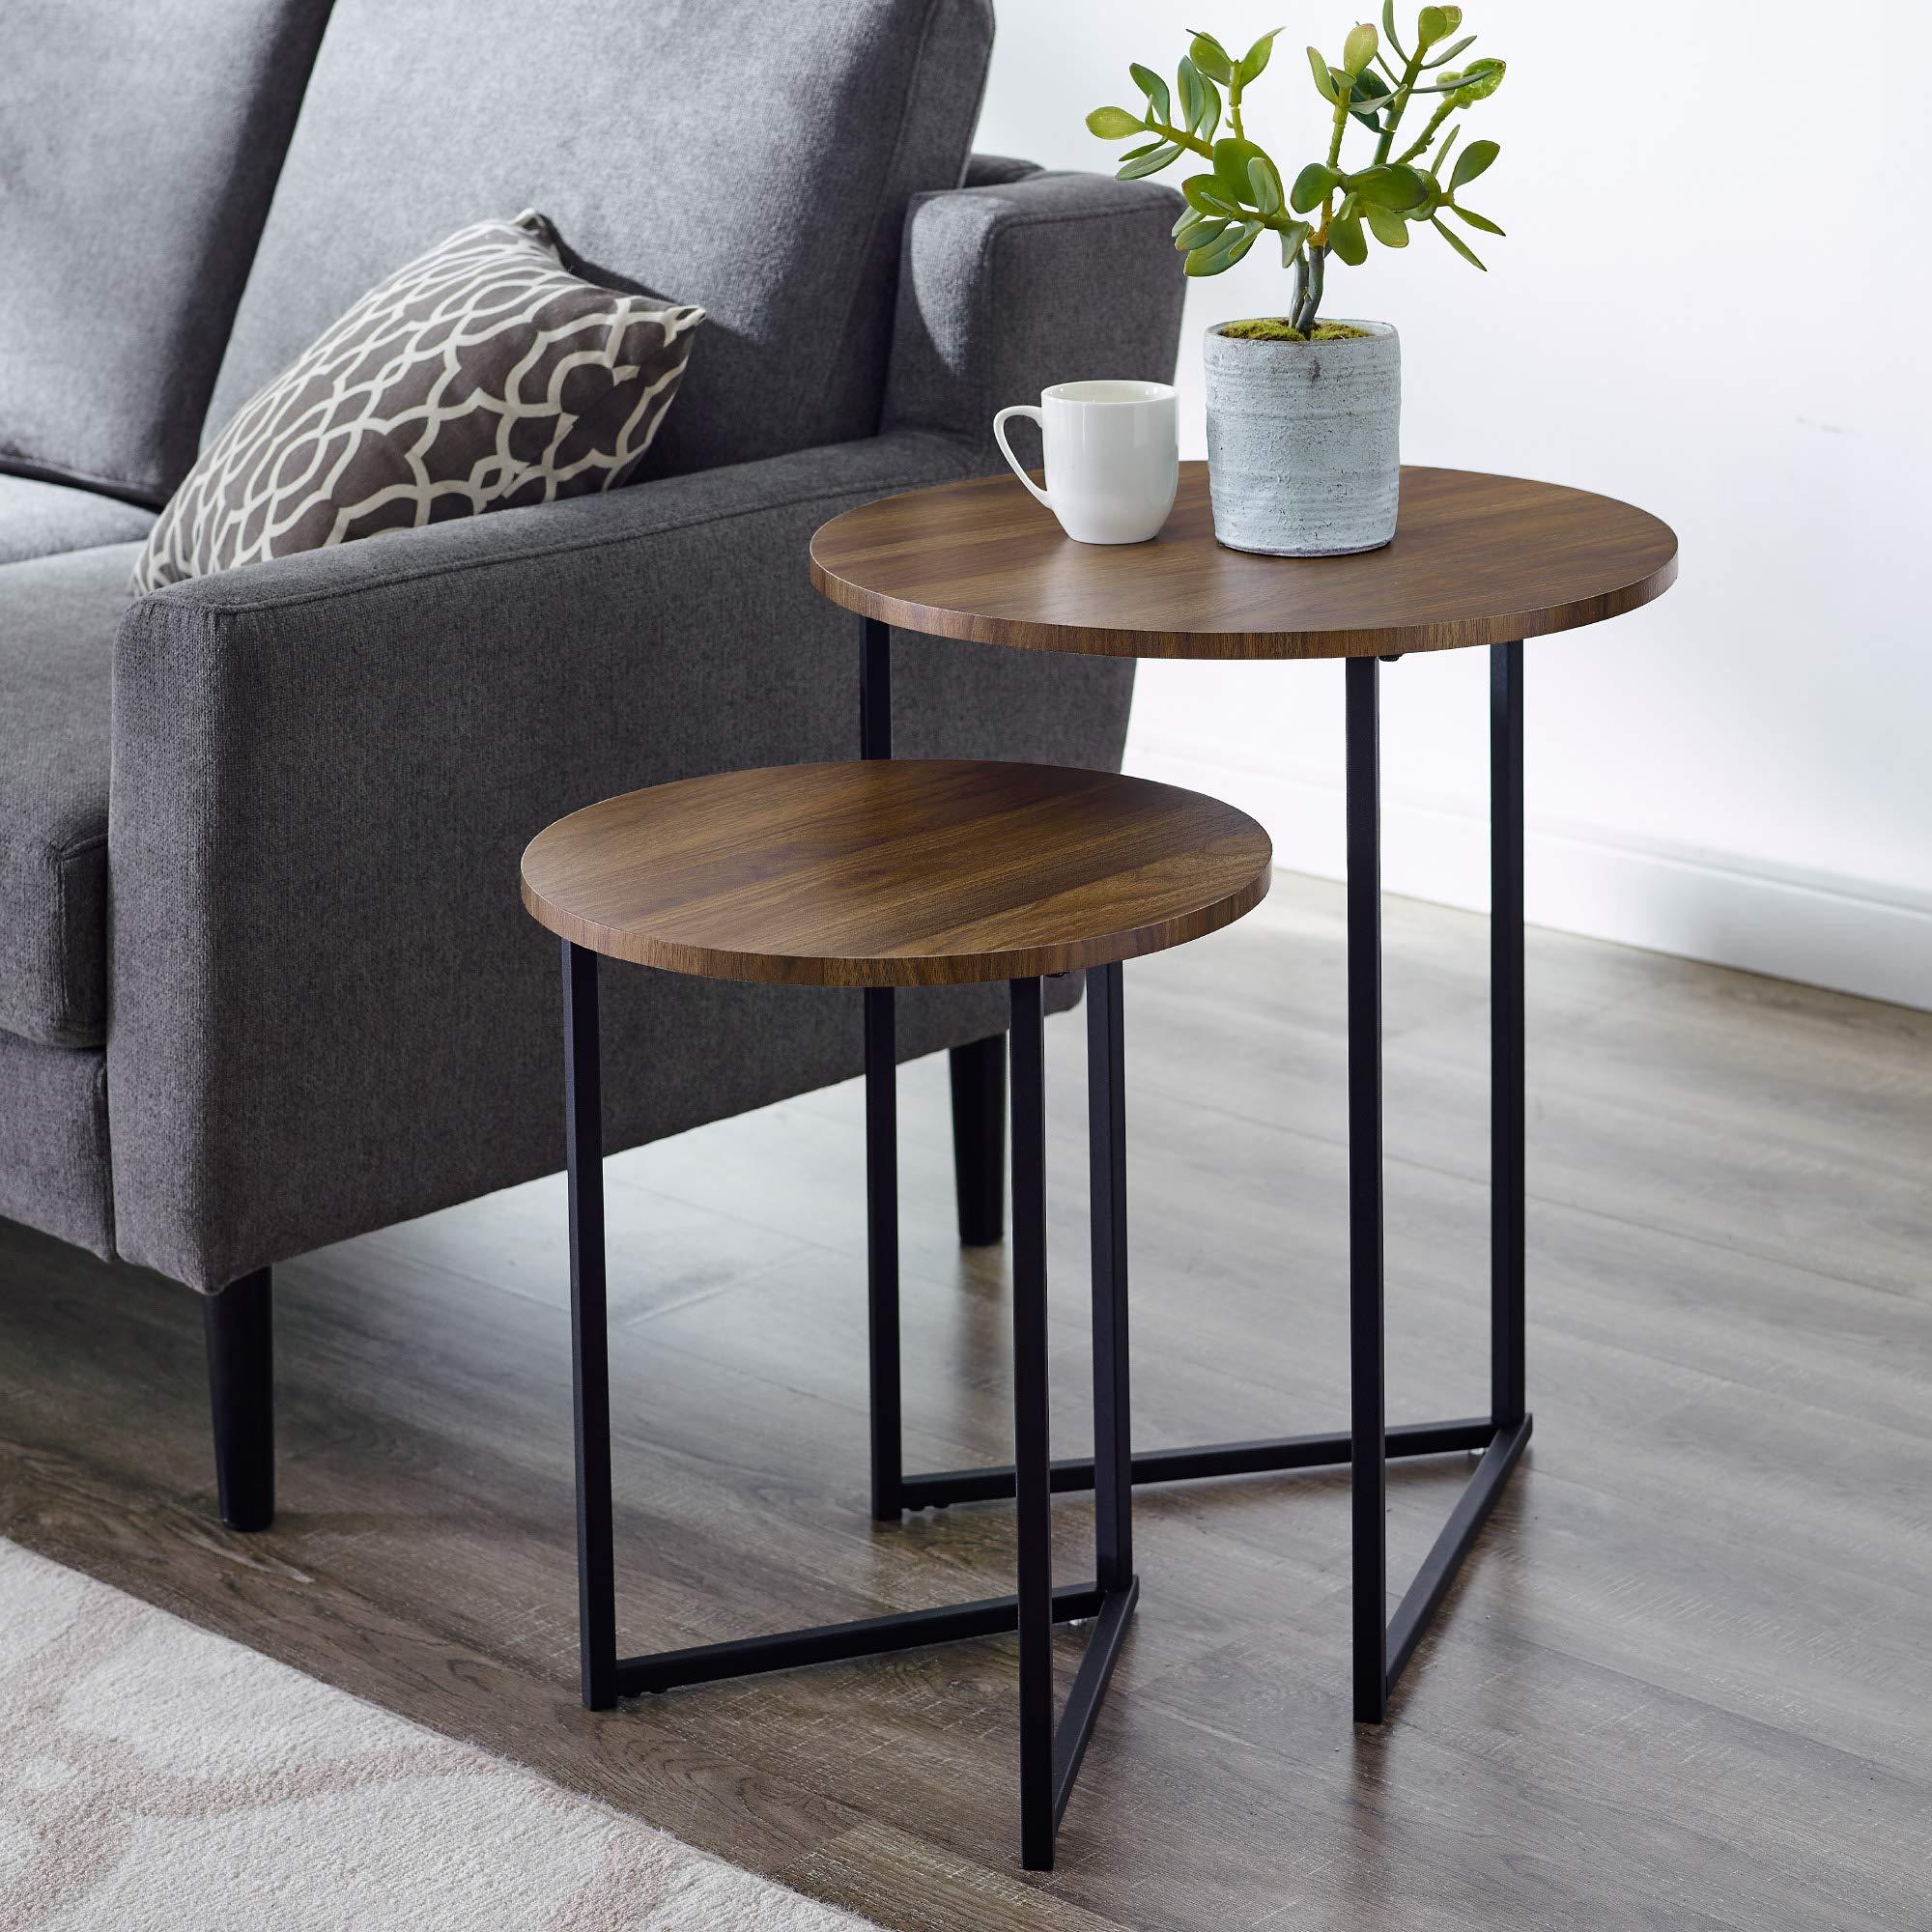 WE Furniture AZFVICNSTDW Side Table, Dark Walnut by WE Furniture